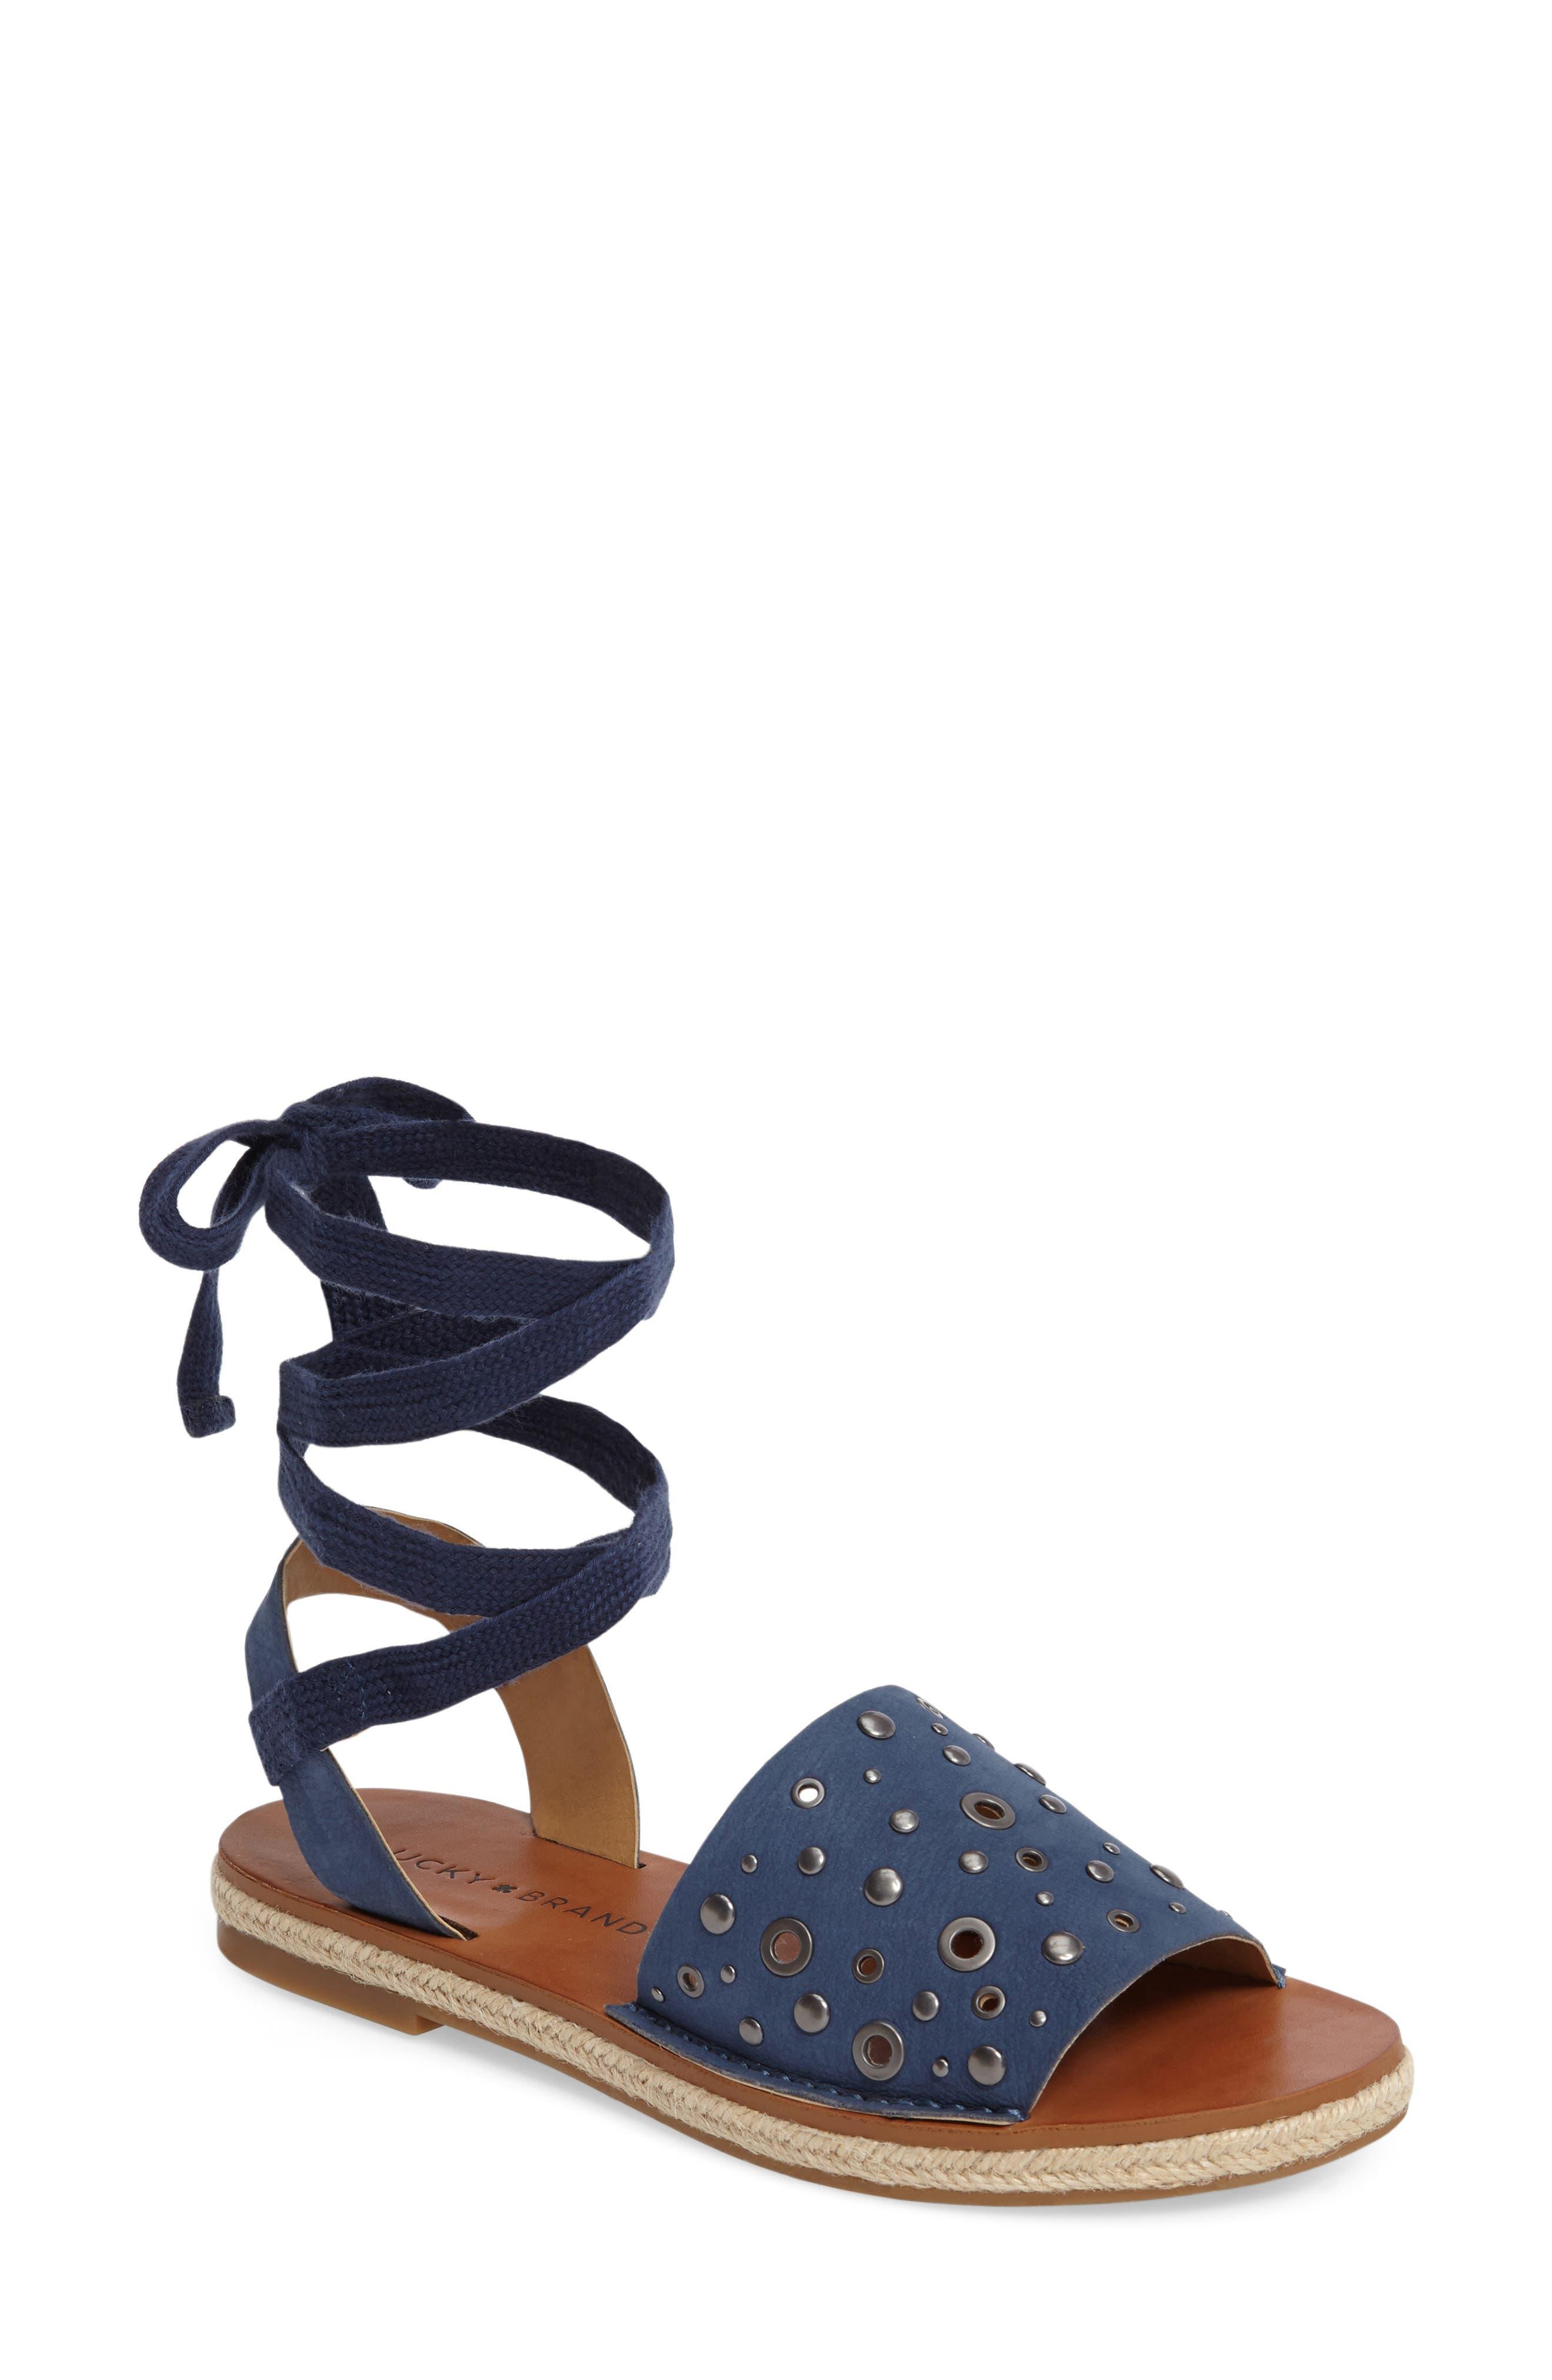 Daytah Ankle Tie Sandal,                             Main thumbnail 1, color,                             Dark Chambray